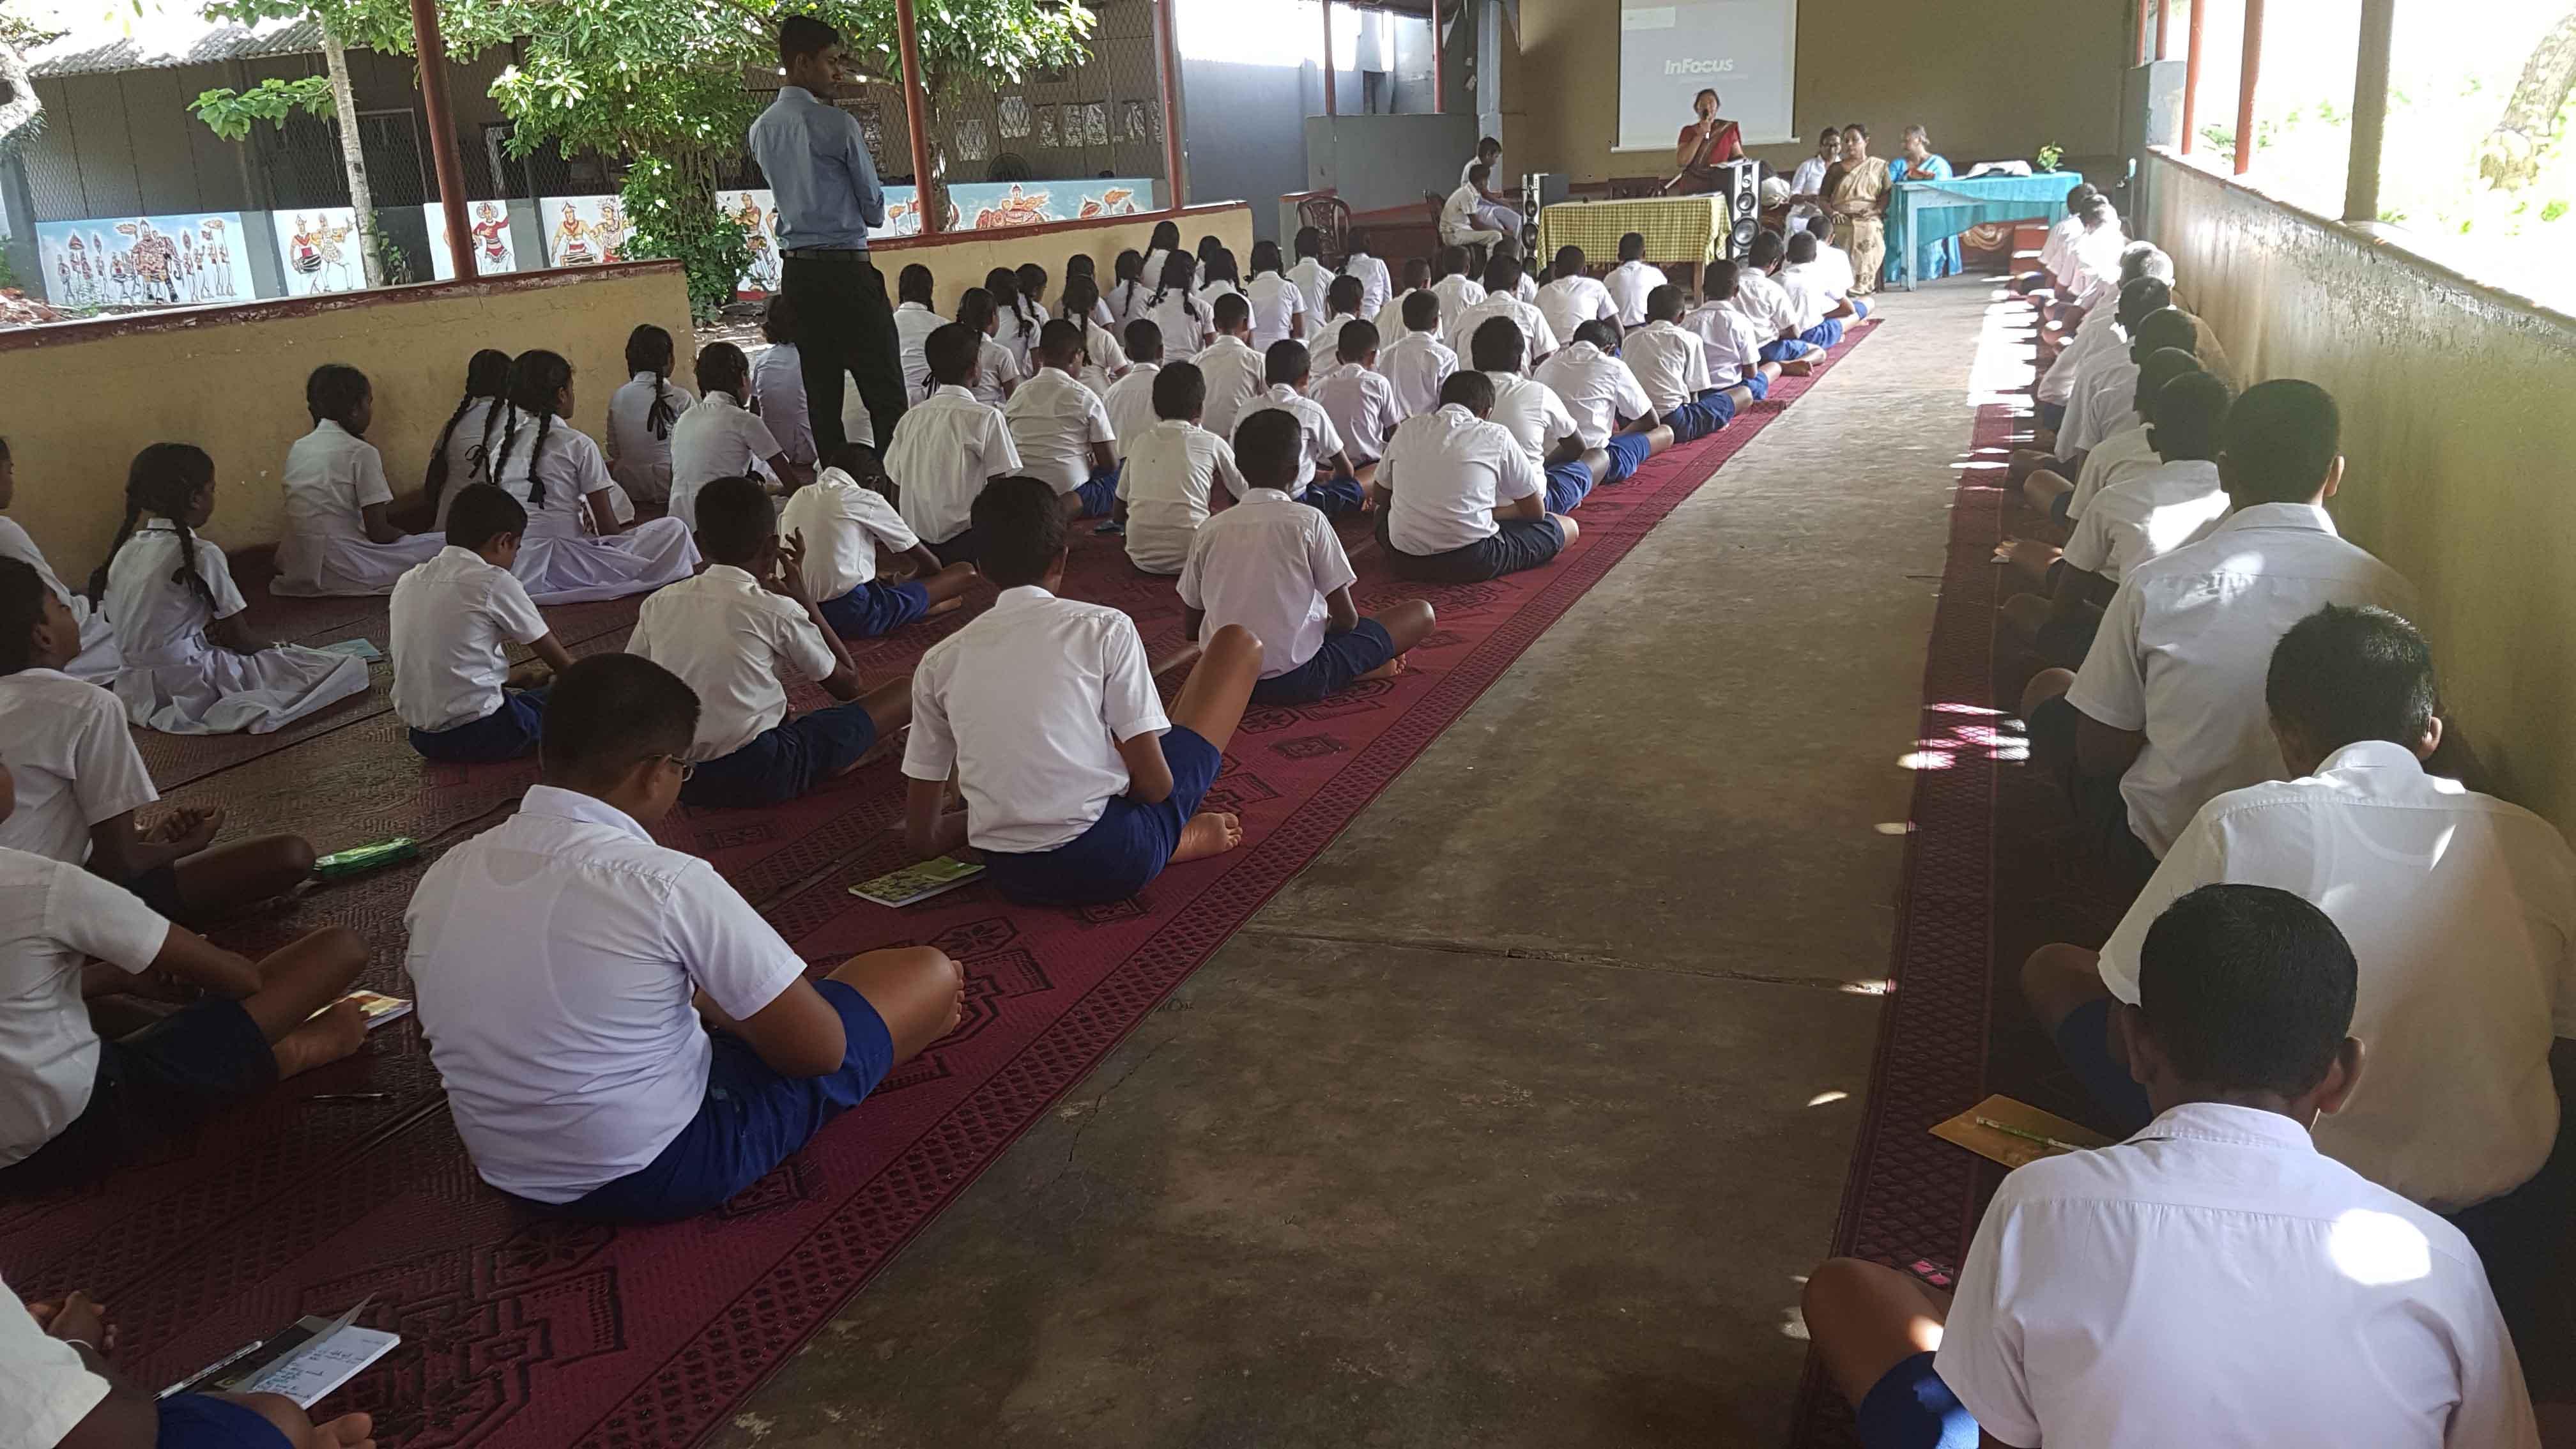 WP/PILI /S.DE S. JAYASINGHE M.M.V Students experienced Mindfulness